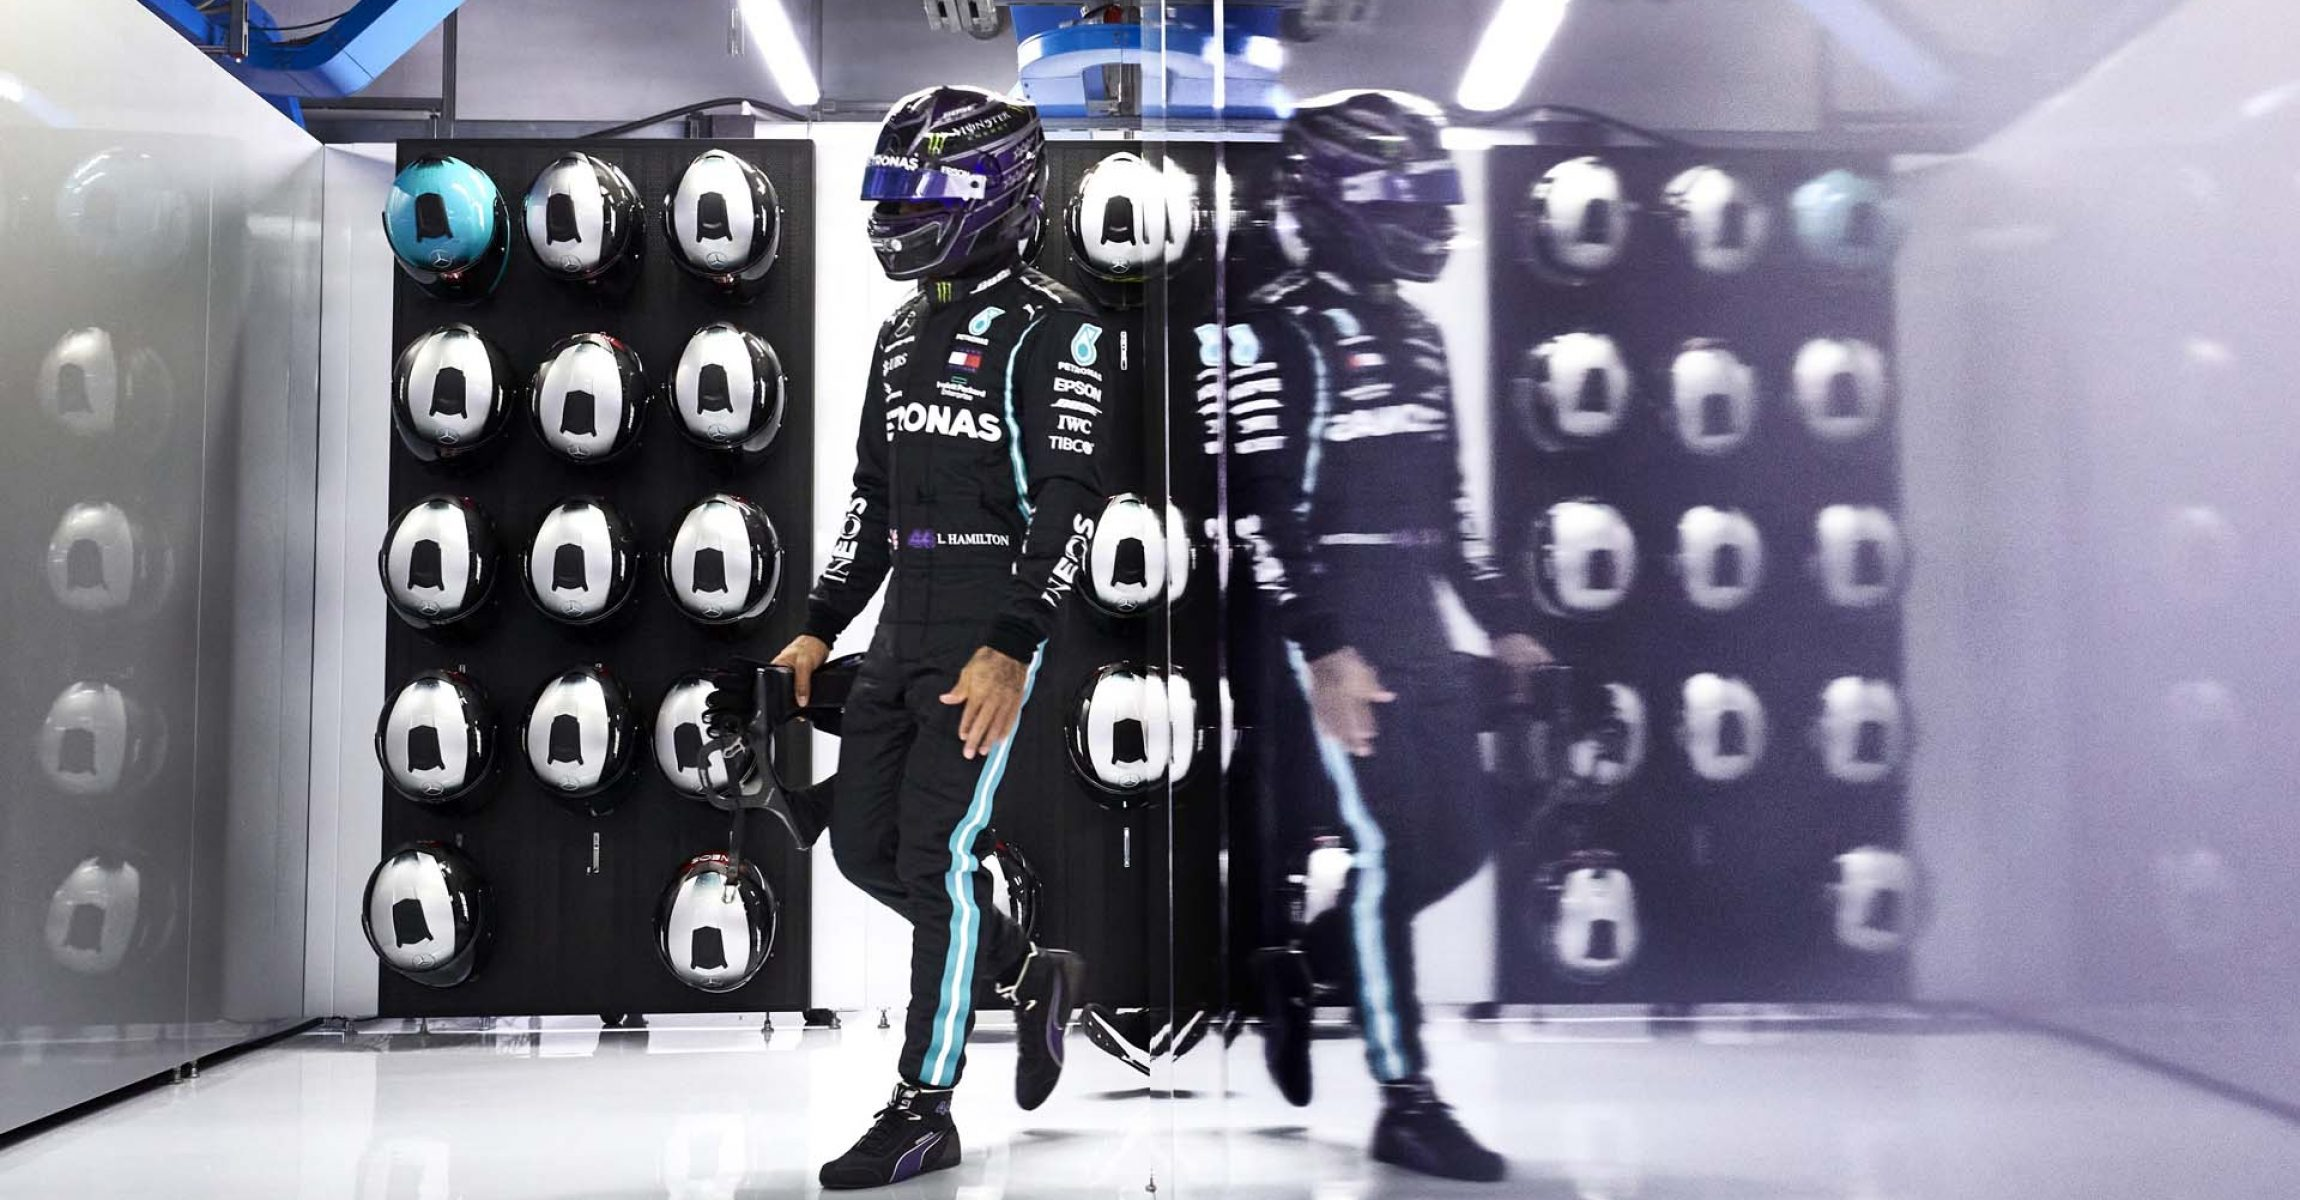 2020 Italian Grand Prix, Saturday - Steve Etherington Lewis Hamilton Mercedes